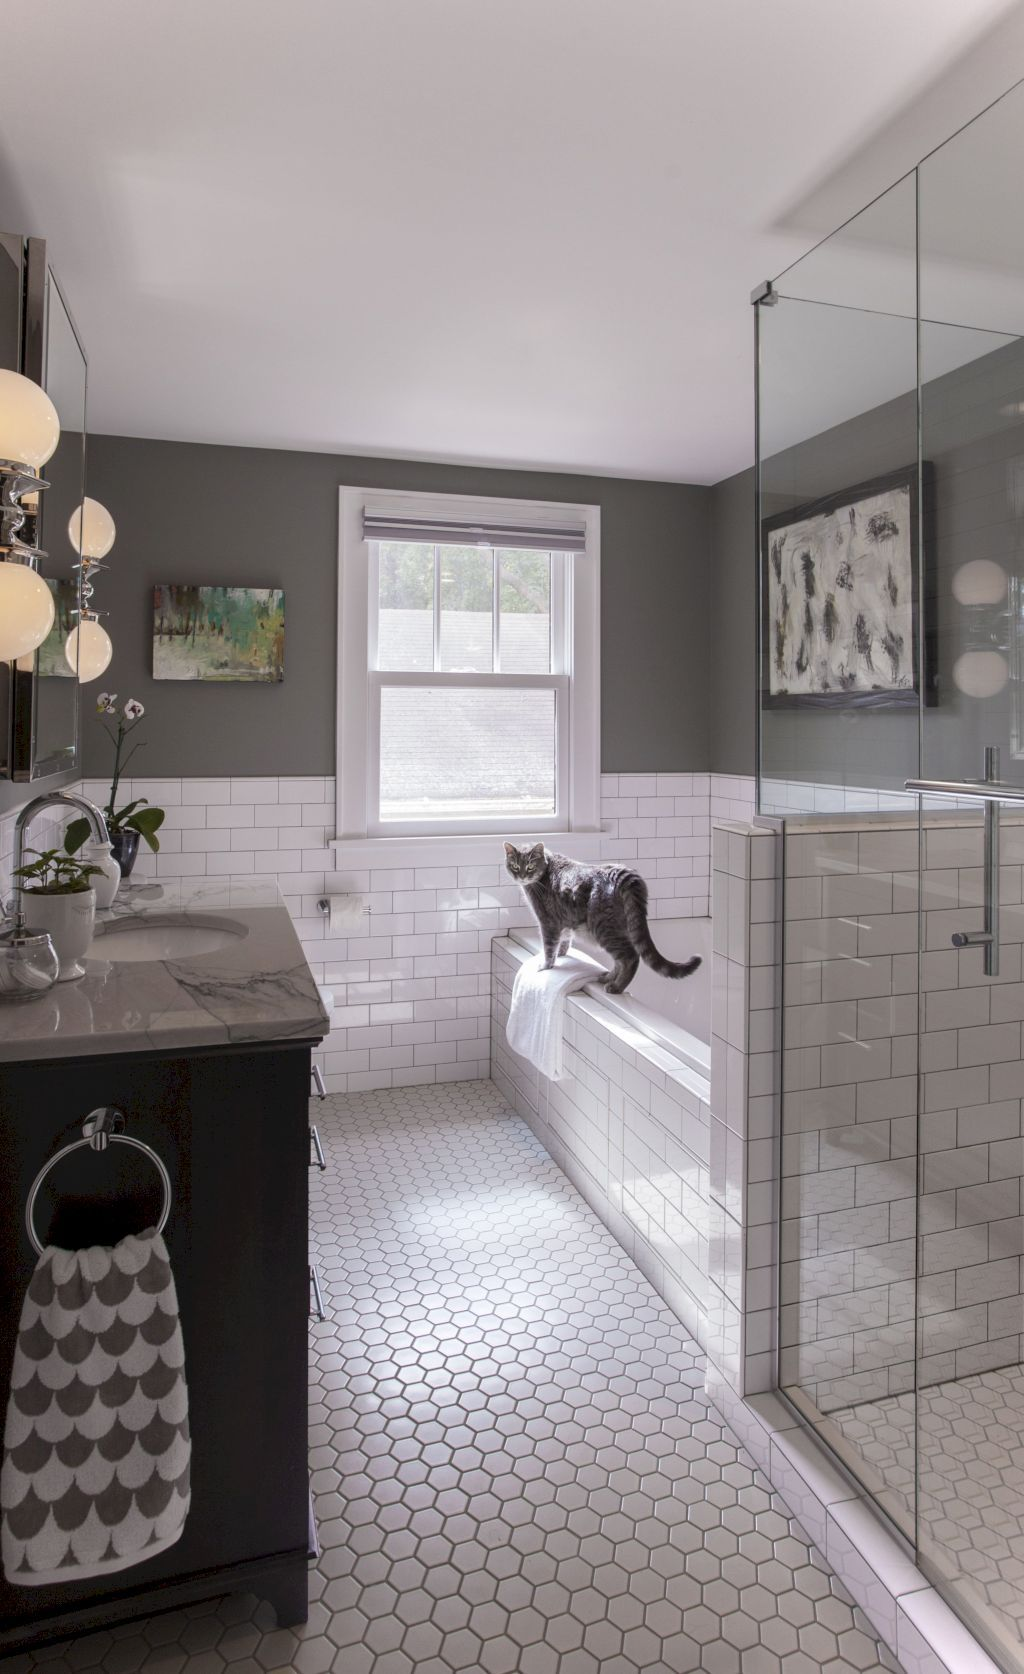 Cool 80 Stunning Farmhouse Bathroom Tiles Ideas Https Homeideas Co 5096 80 Stunning Farmhouse Bat Bathrooms Remodel Upstairs Bathrooms Small Bathroom Remodel